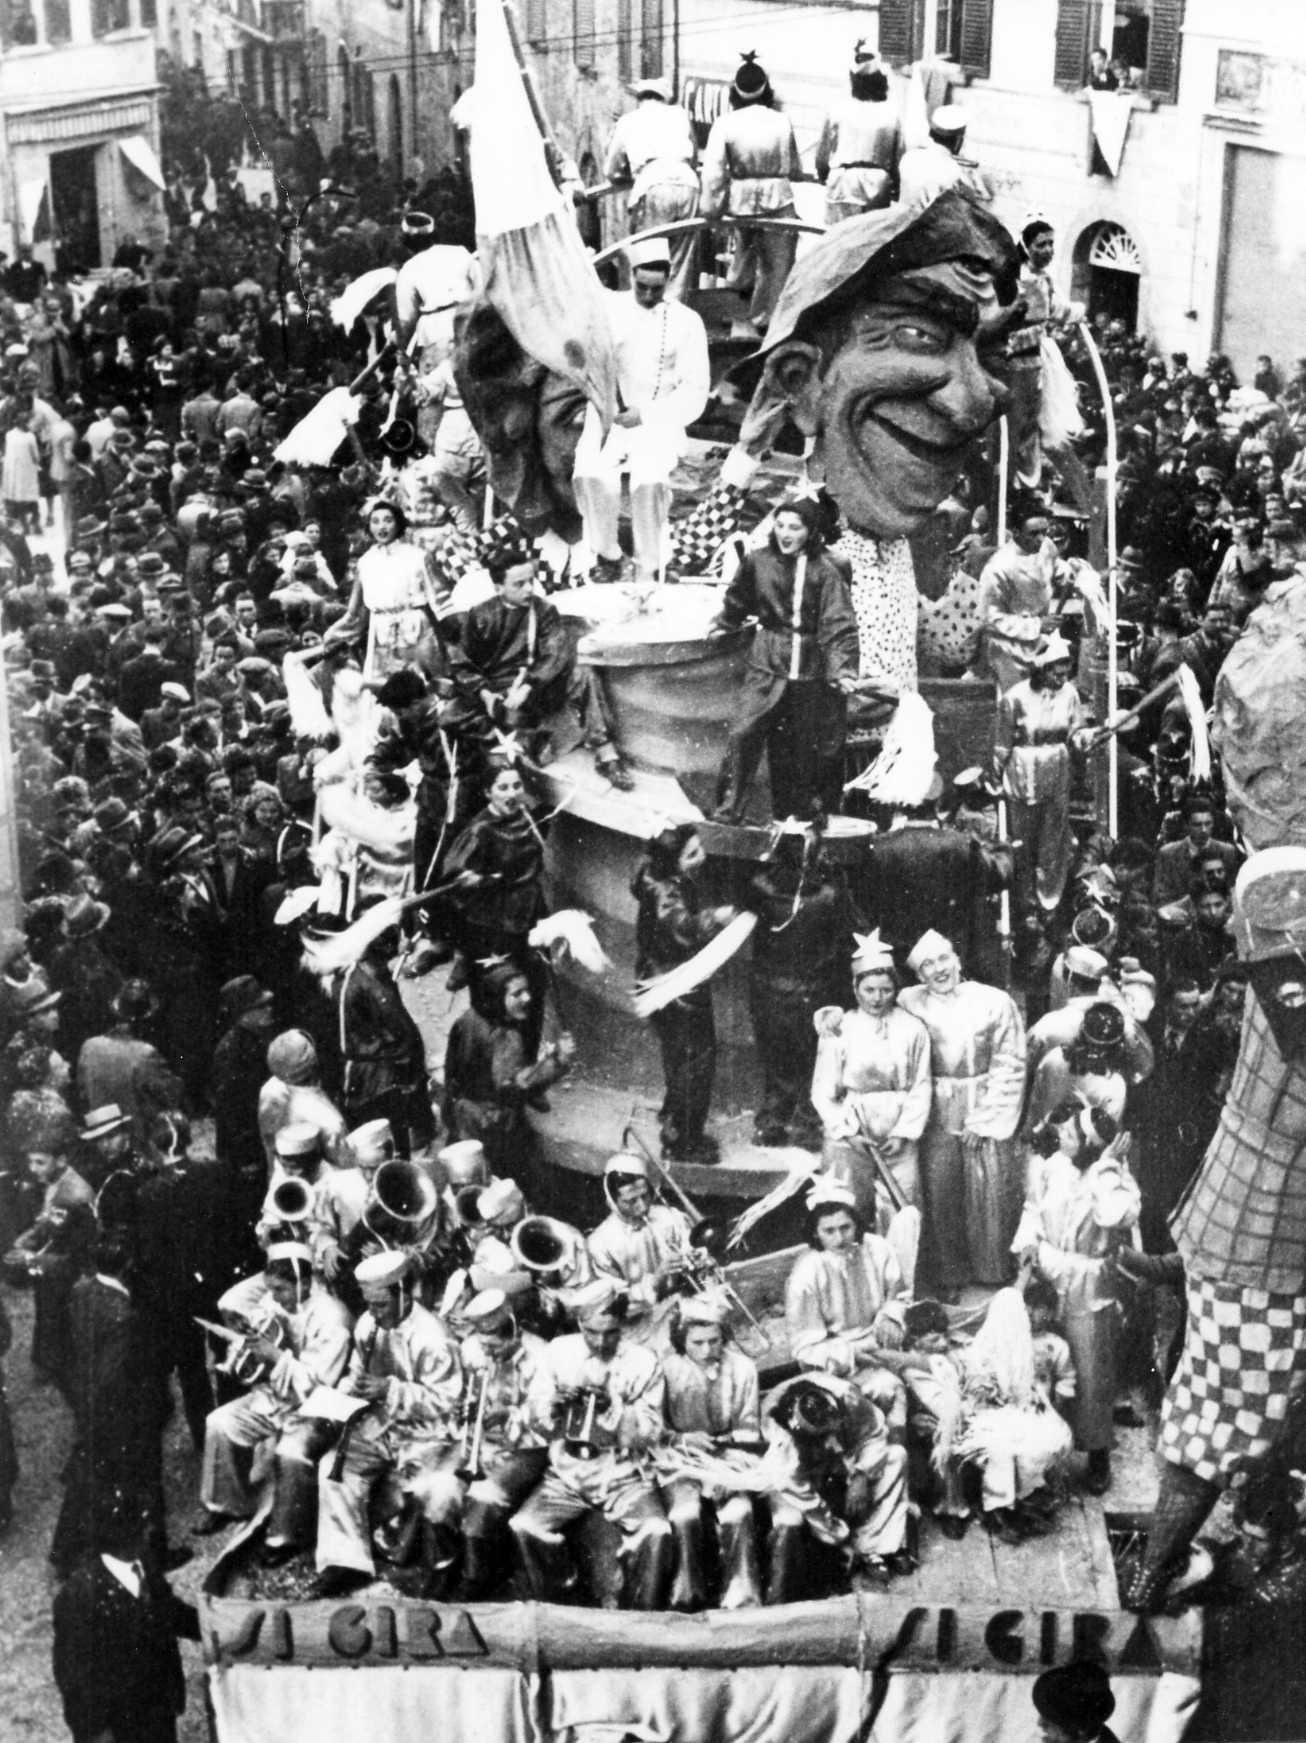 SI GIRA-1939